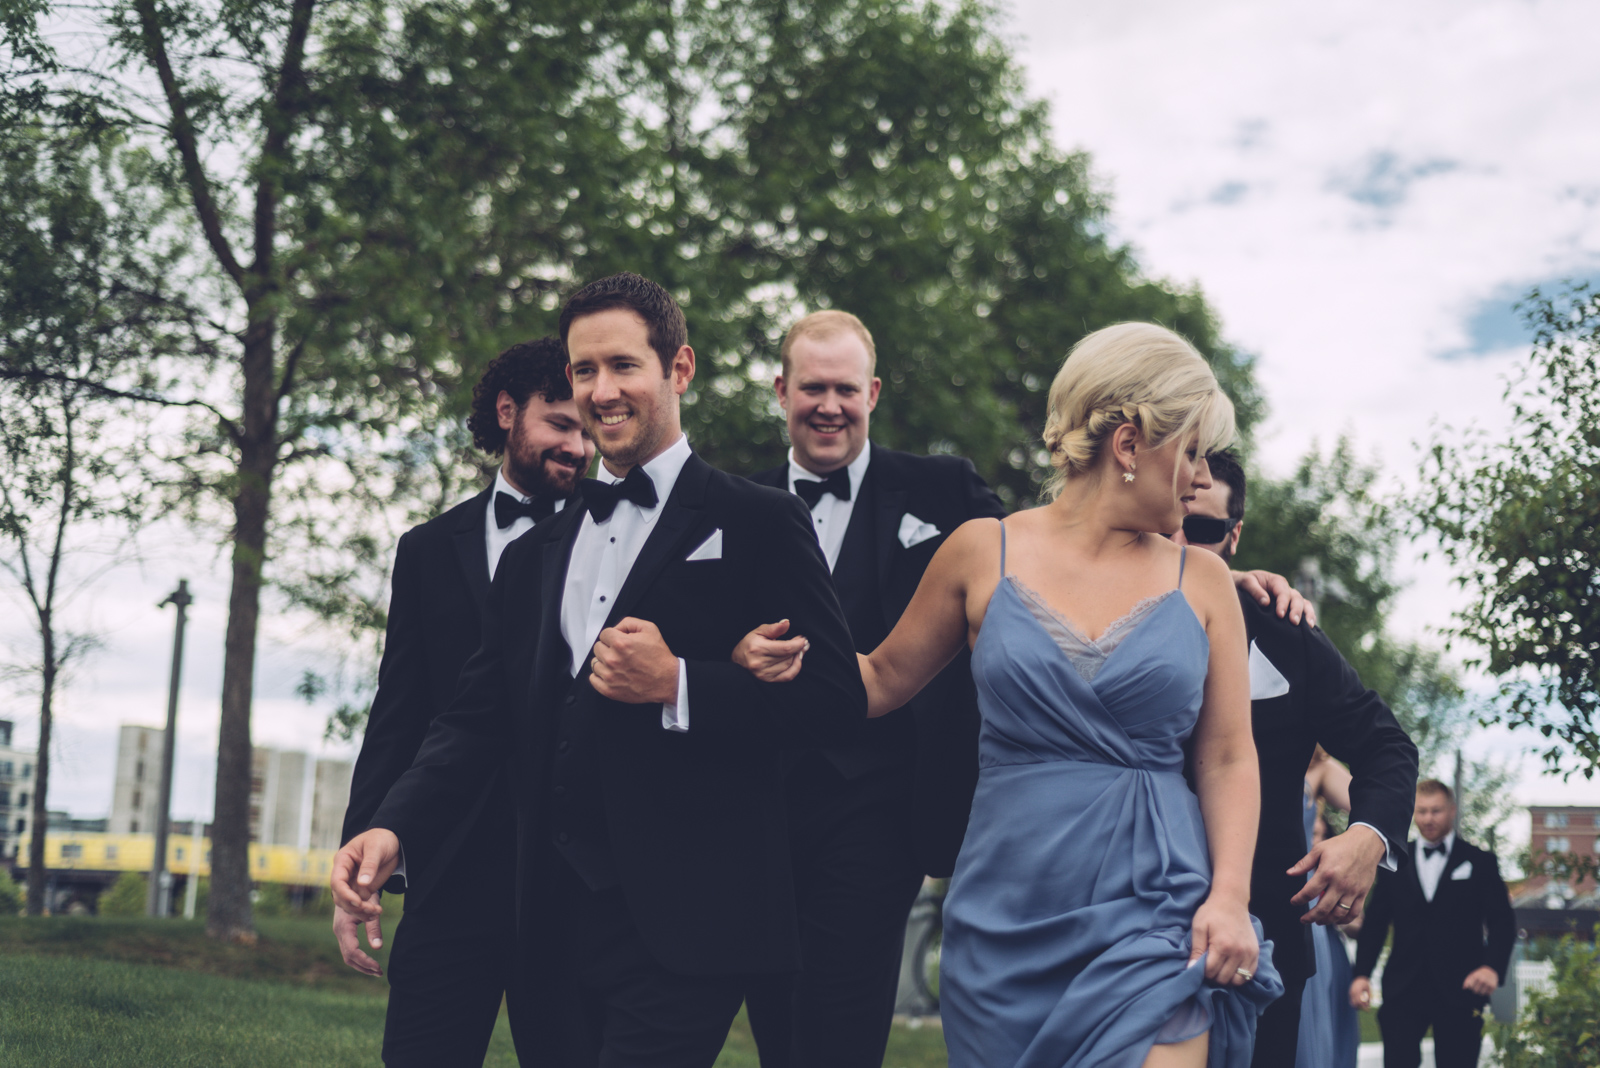 jessica_jonathon_wedding_blog81.jpg